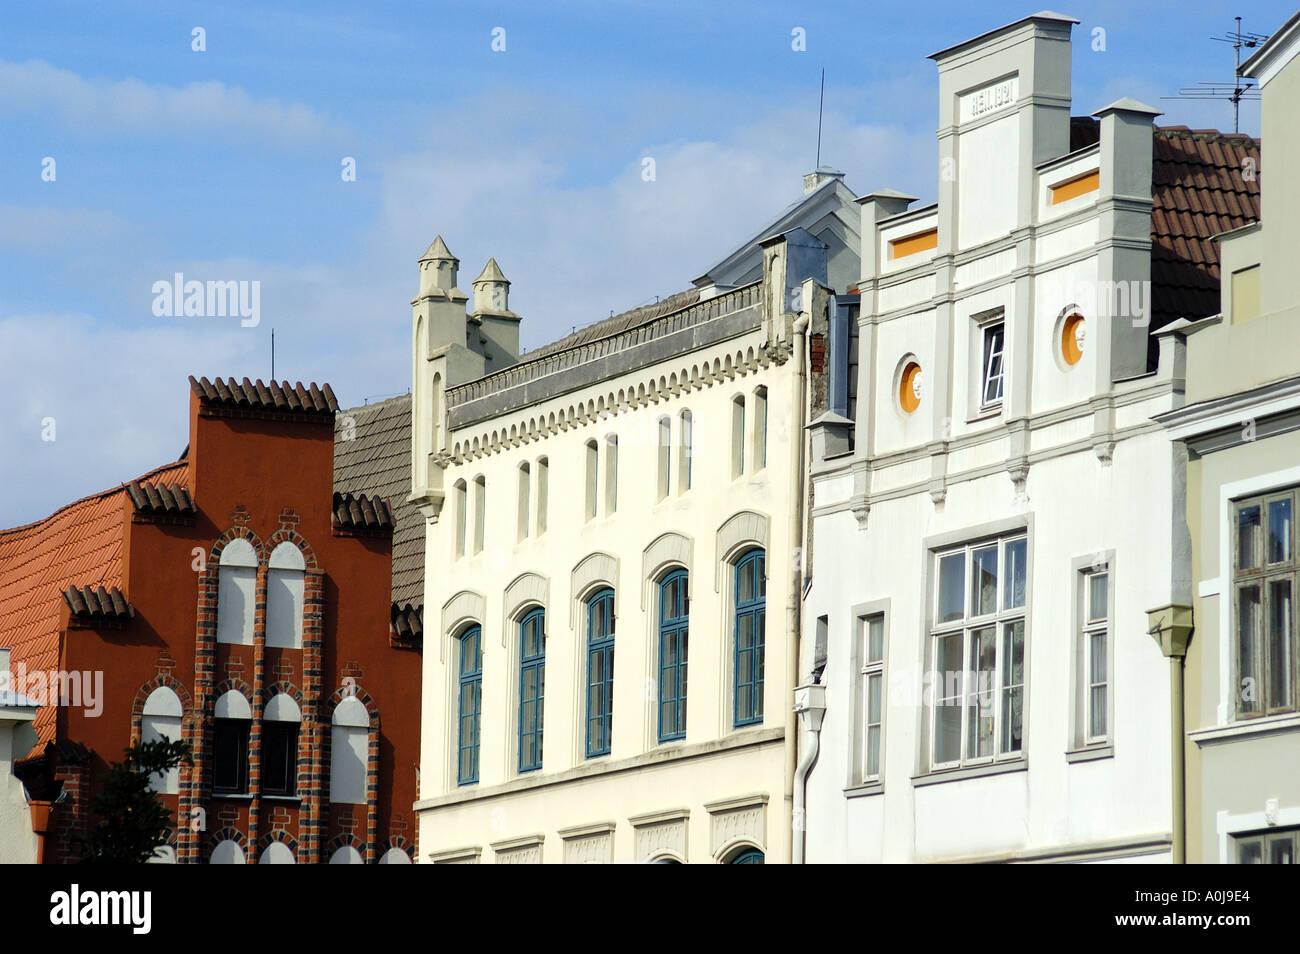 Facades in Wismar - Stock Image